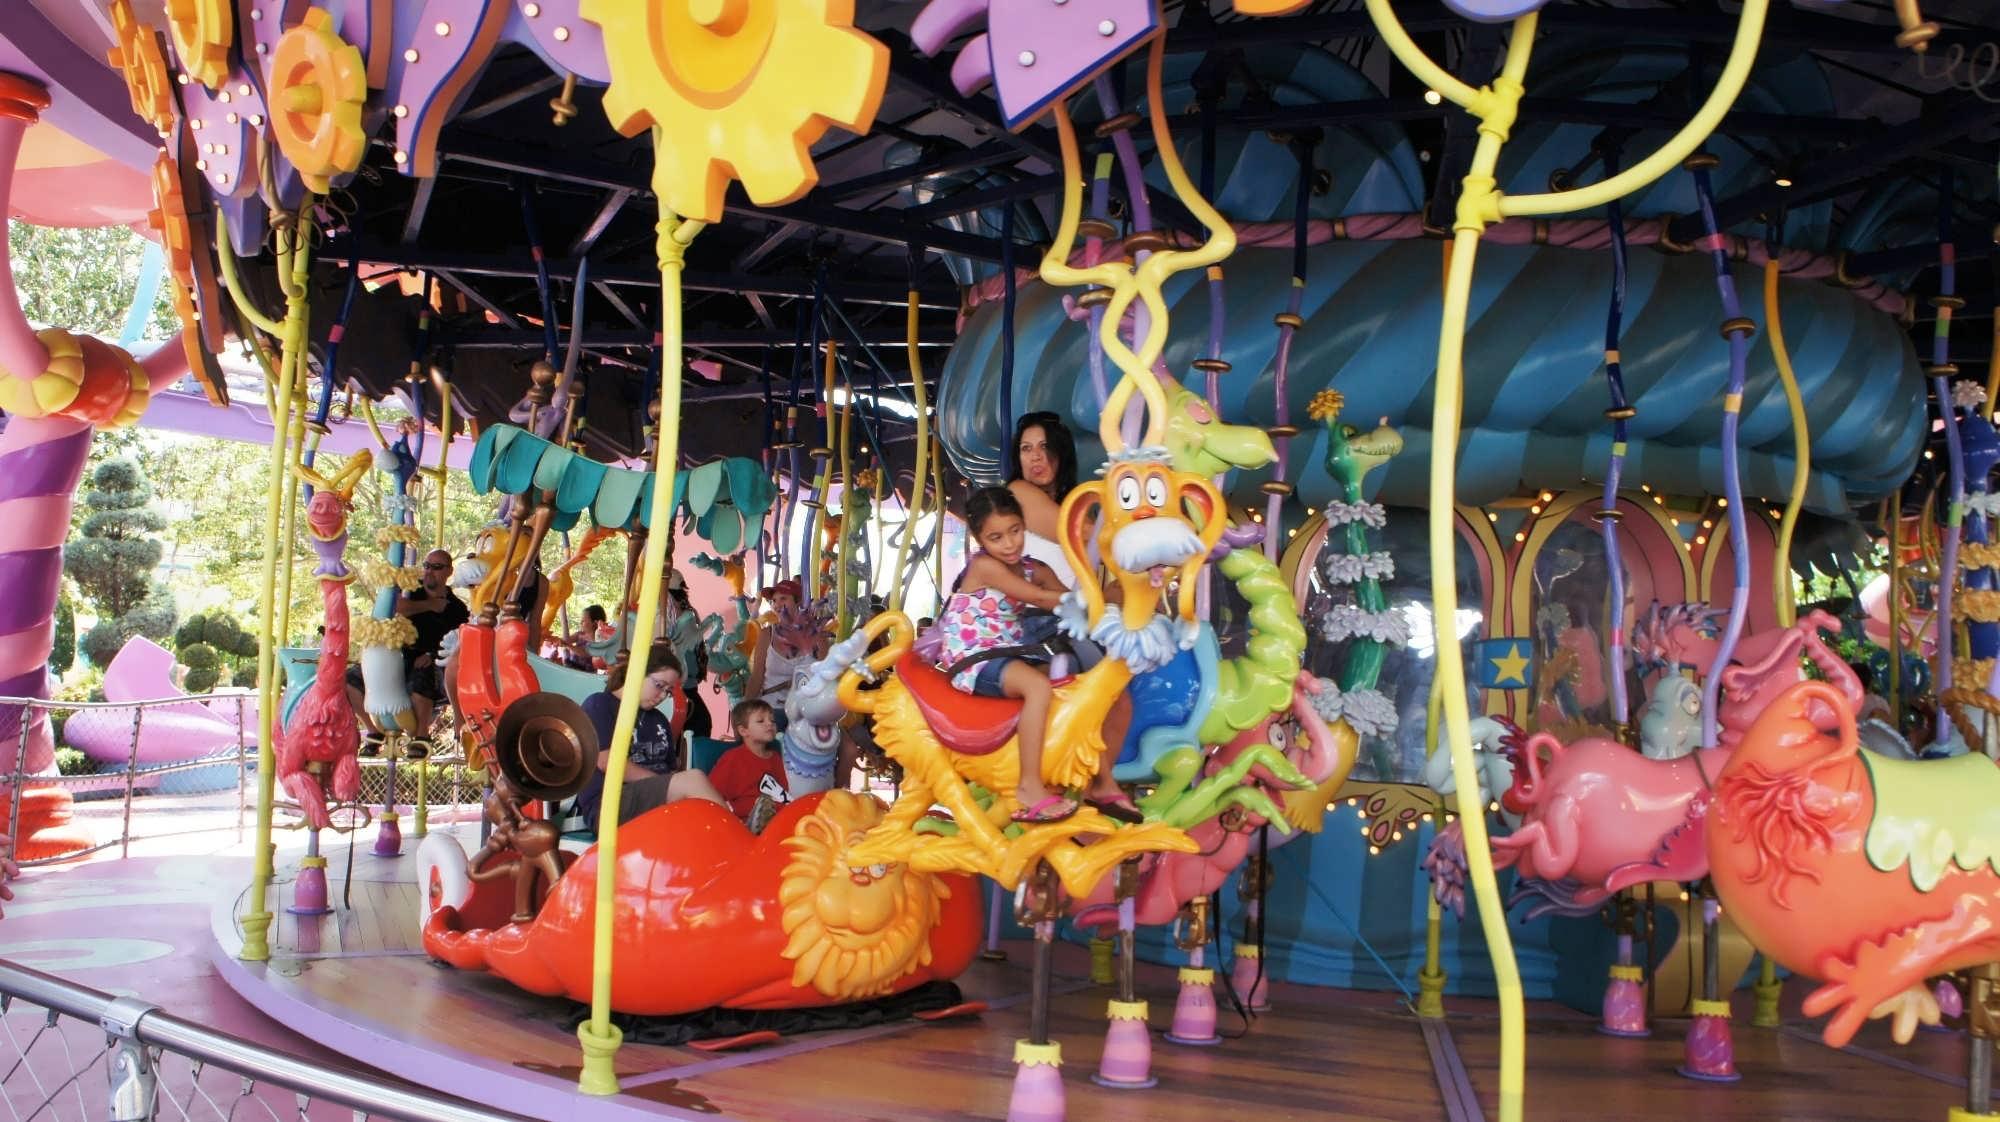 Caro-Seuss-el at Universal's Islands of Adventure.